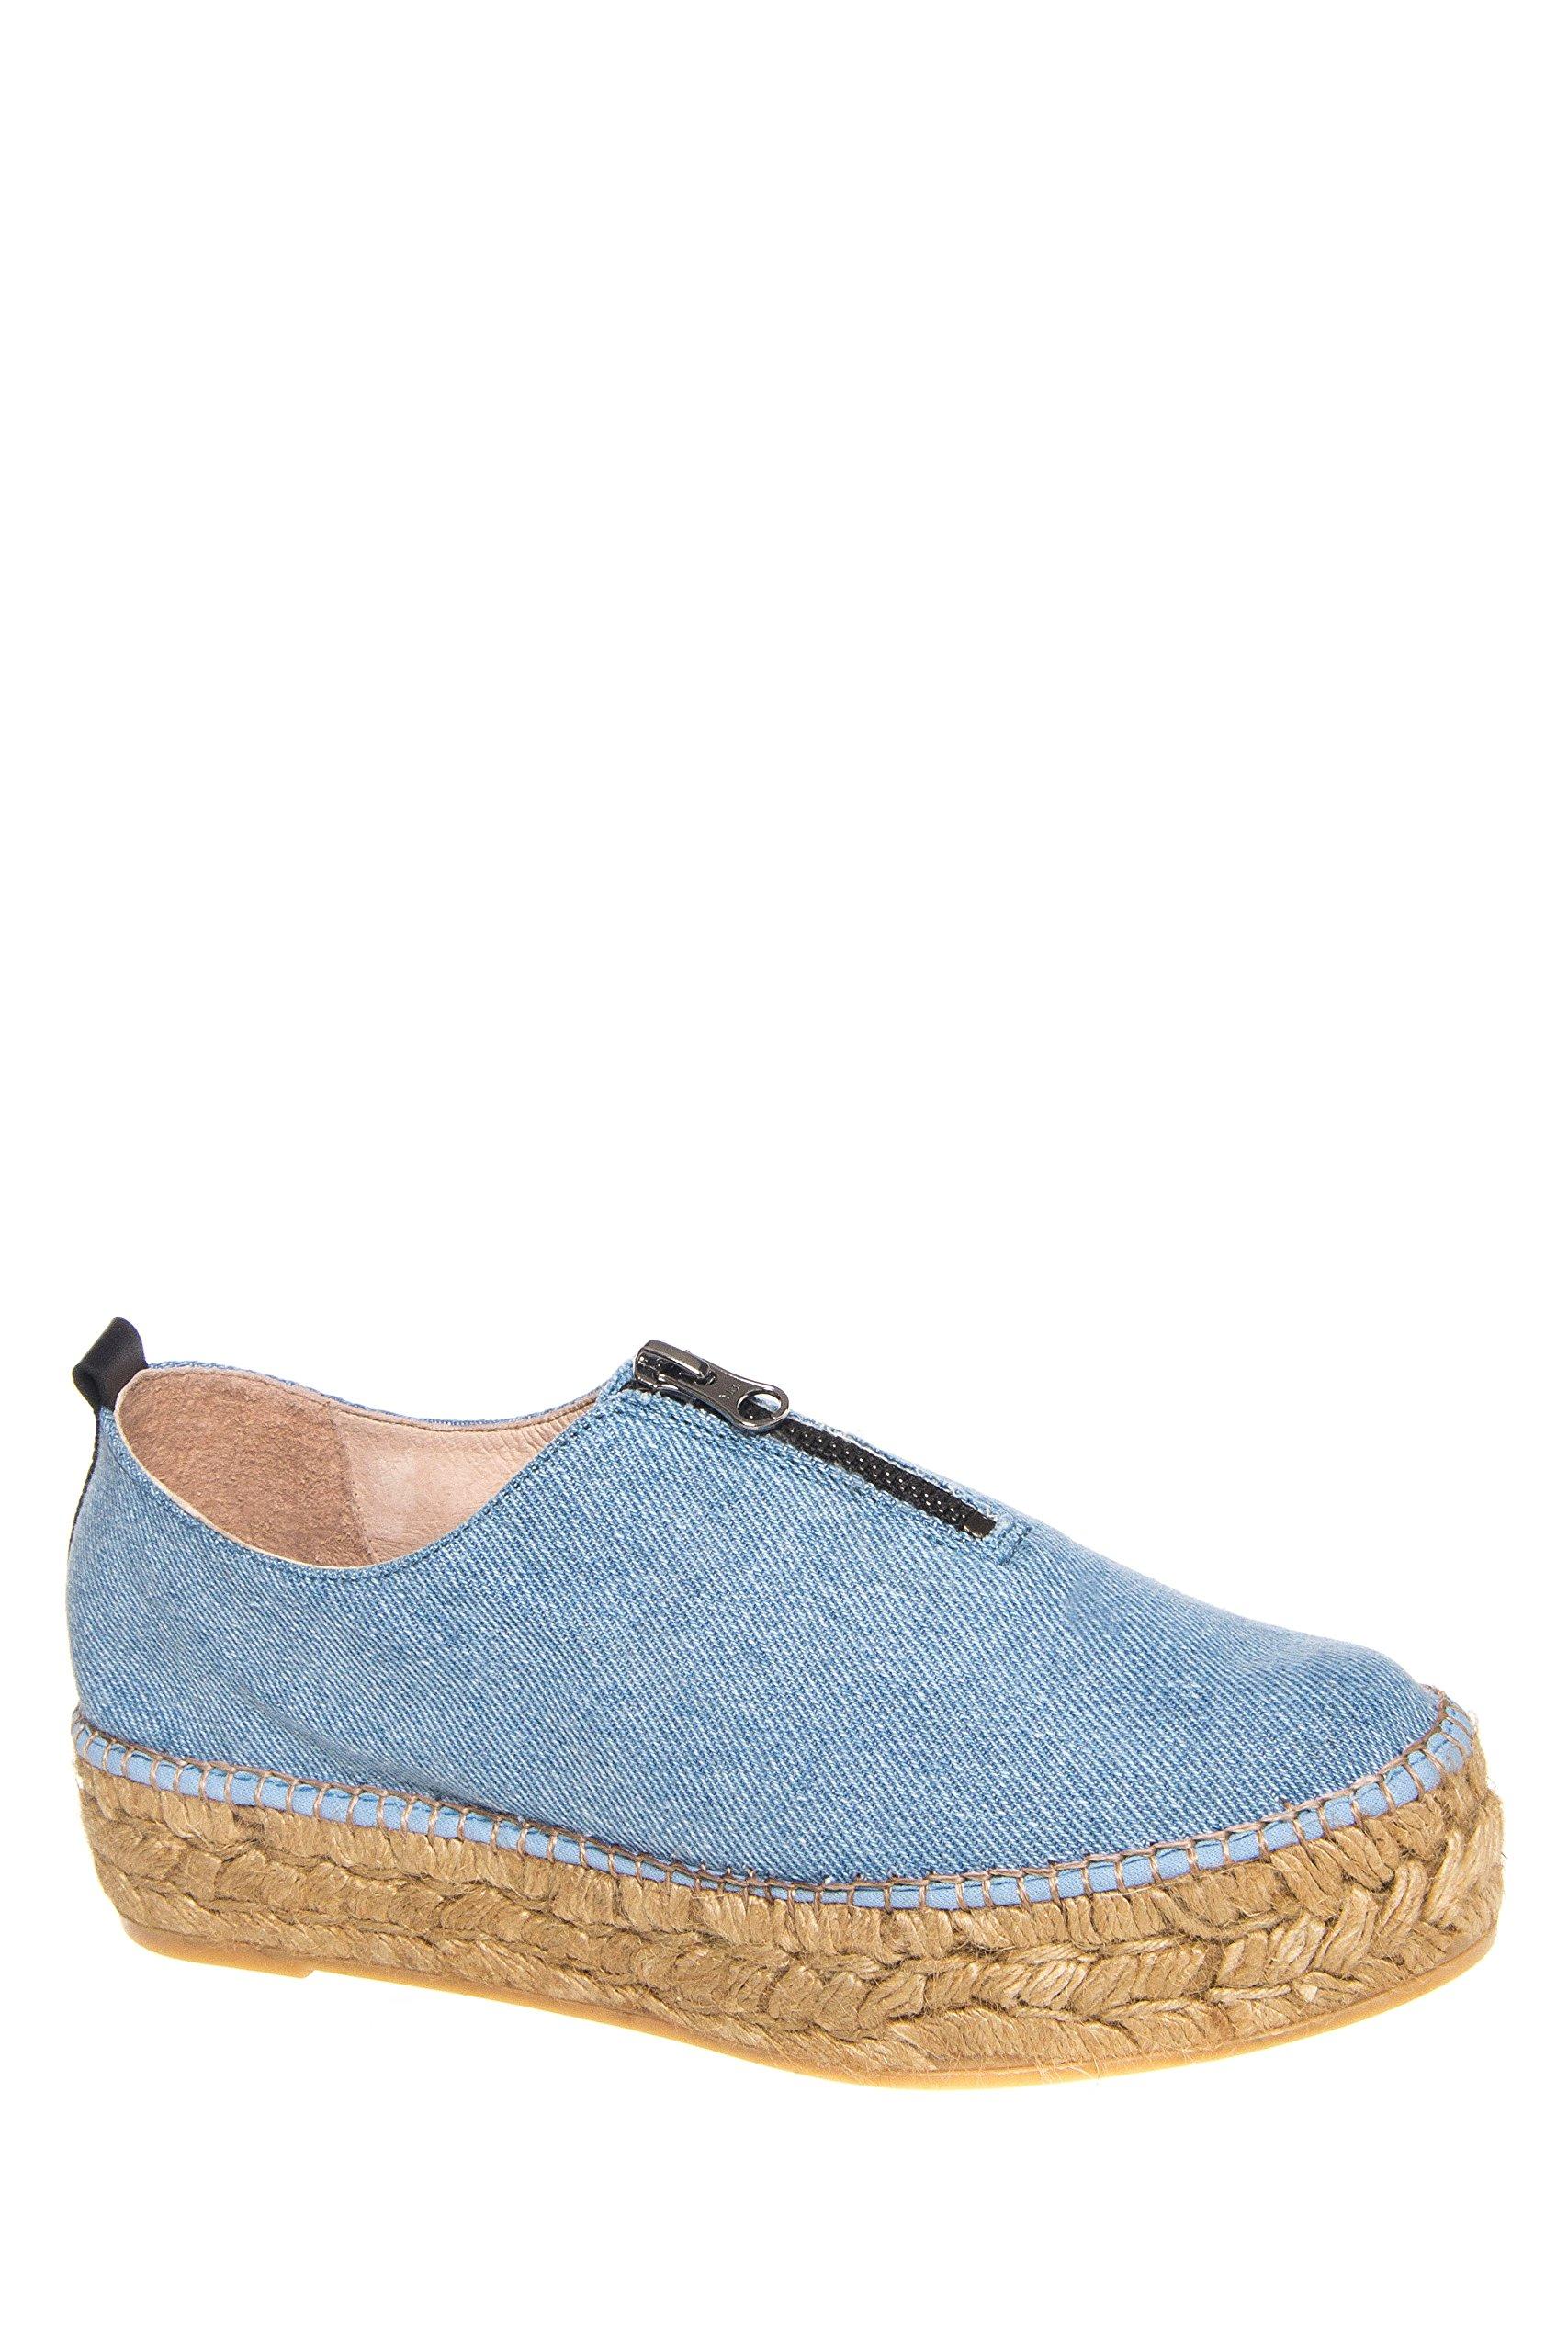 Eric Michael Women's Serena Shoes, Denim, Size - 39